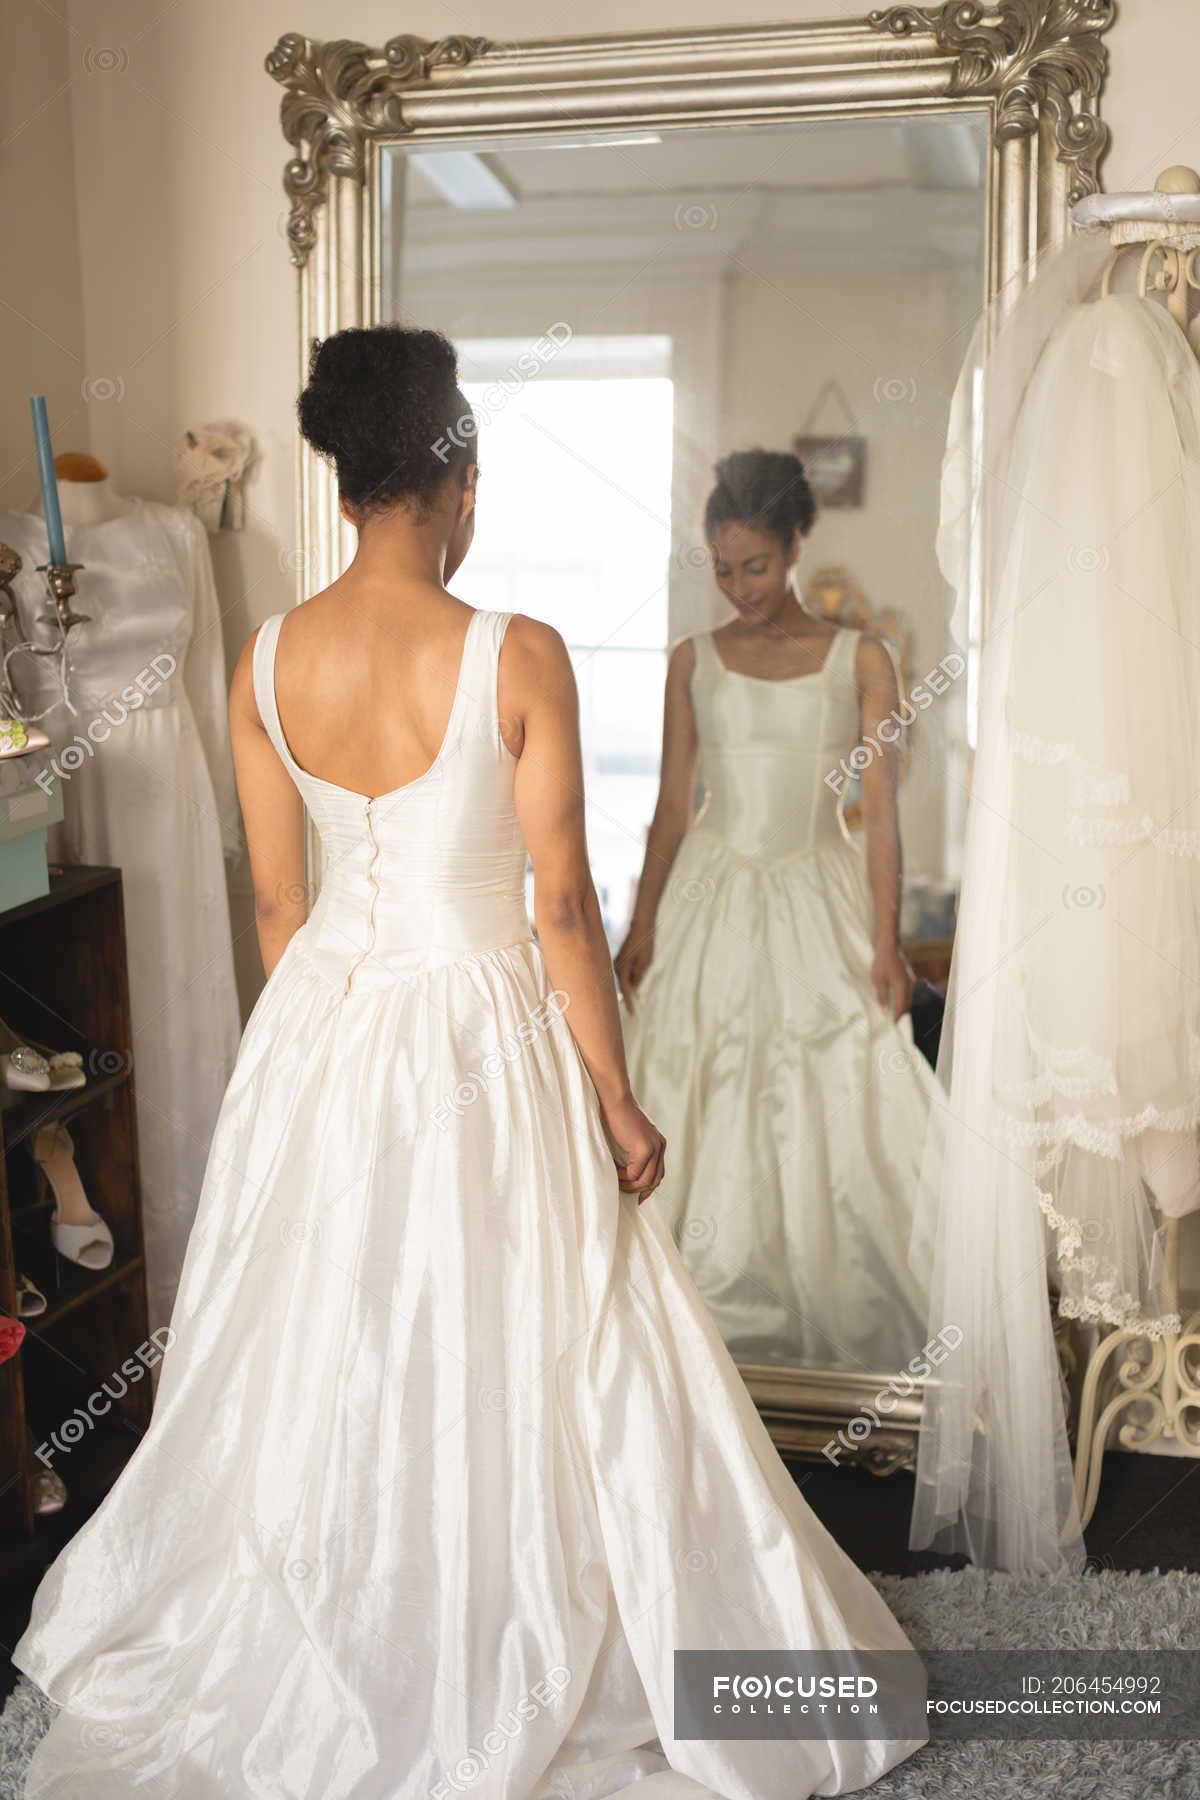 70371da0954 Young bride in a wedding dress looking into mirror at boutique — Stock  photos